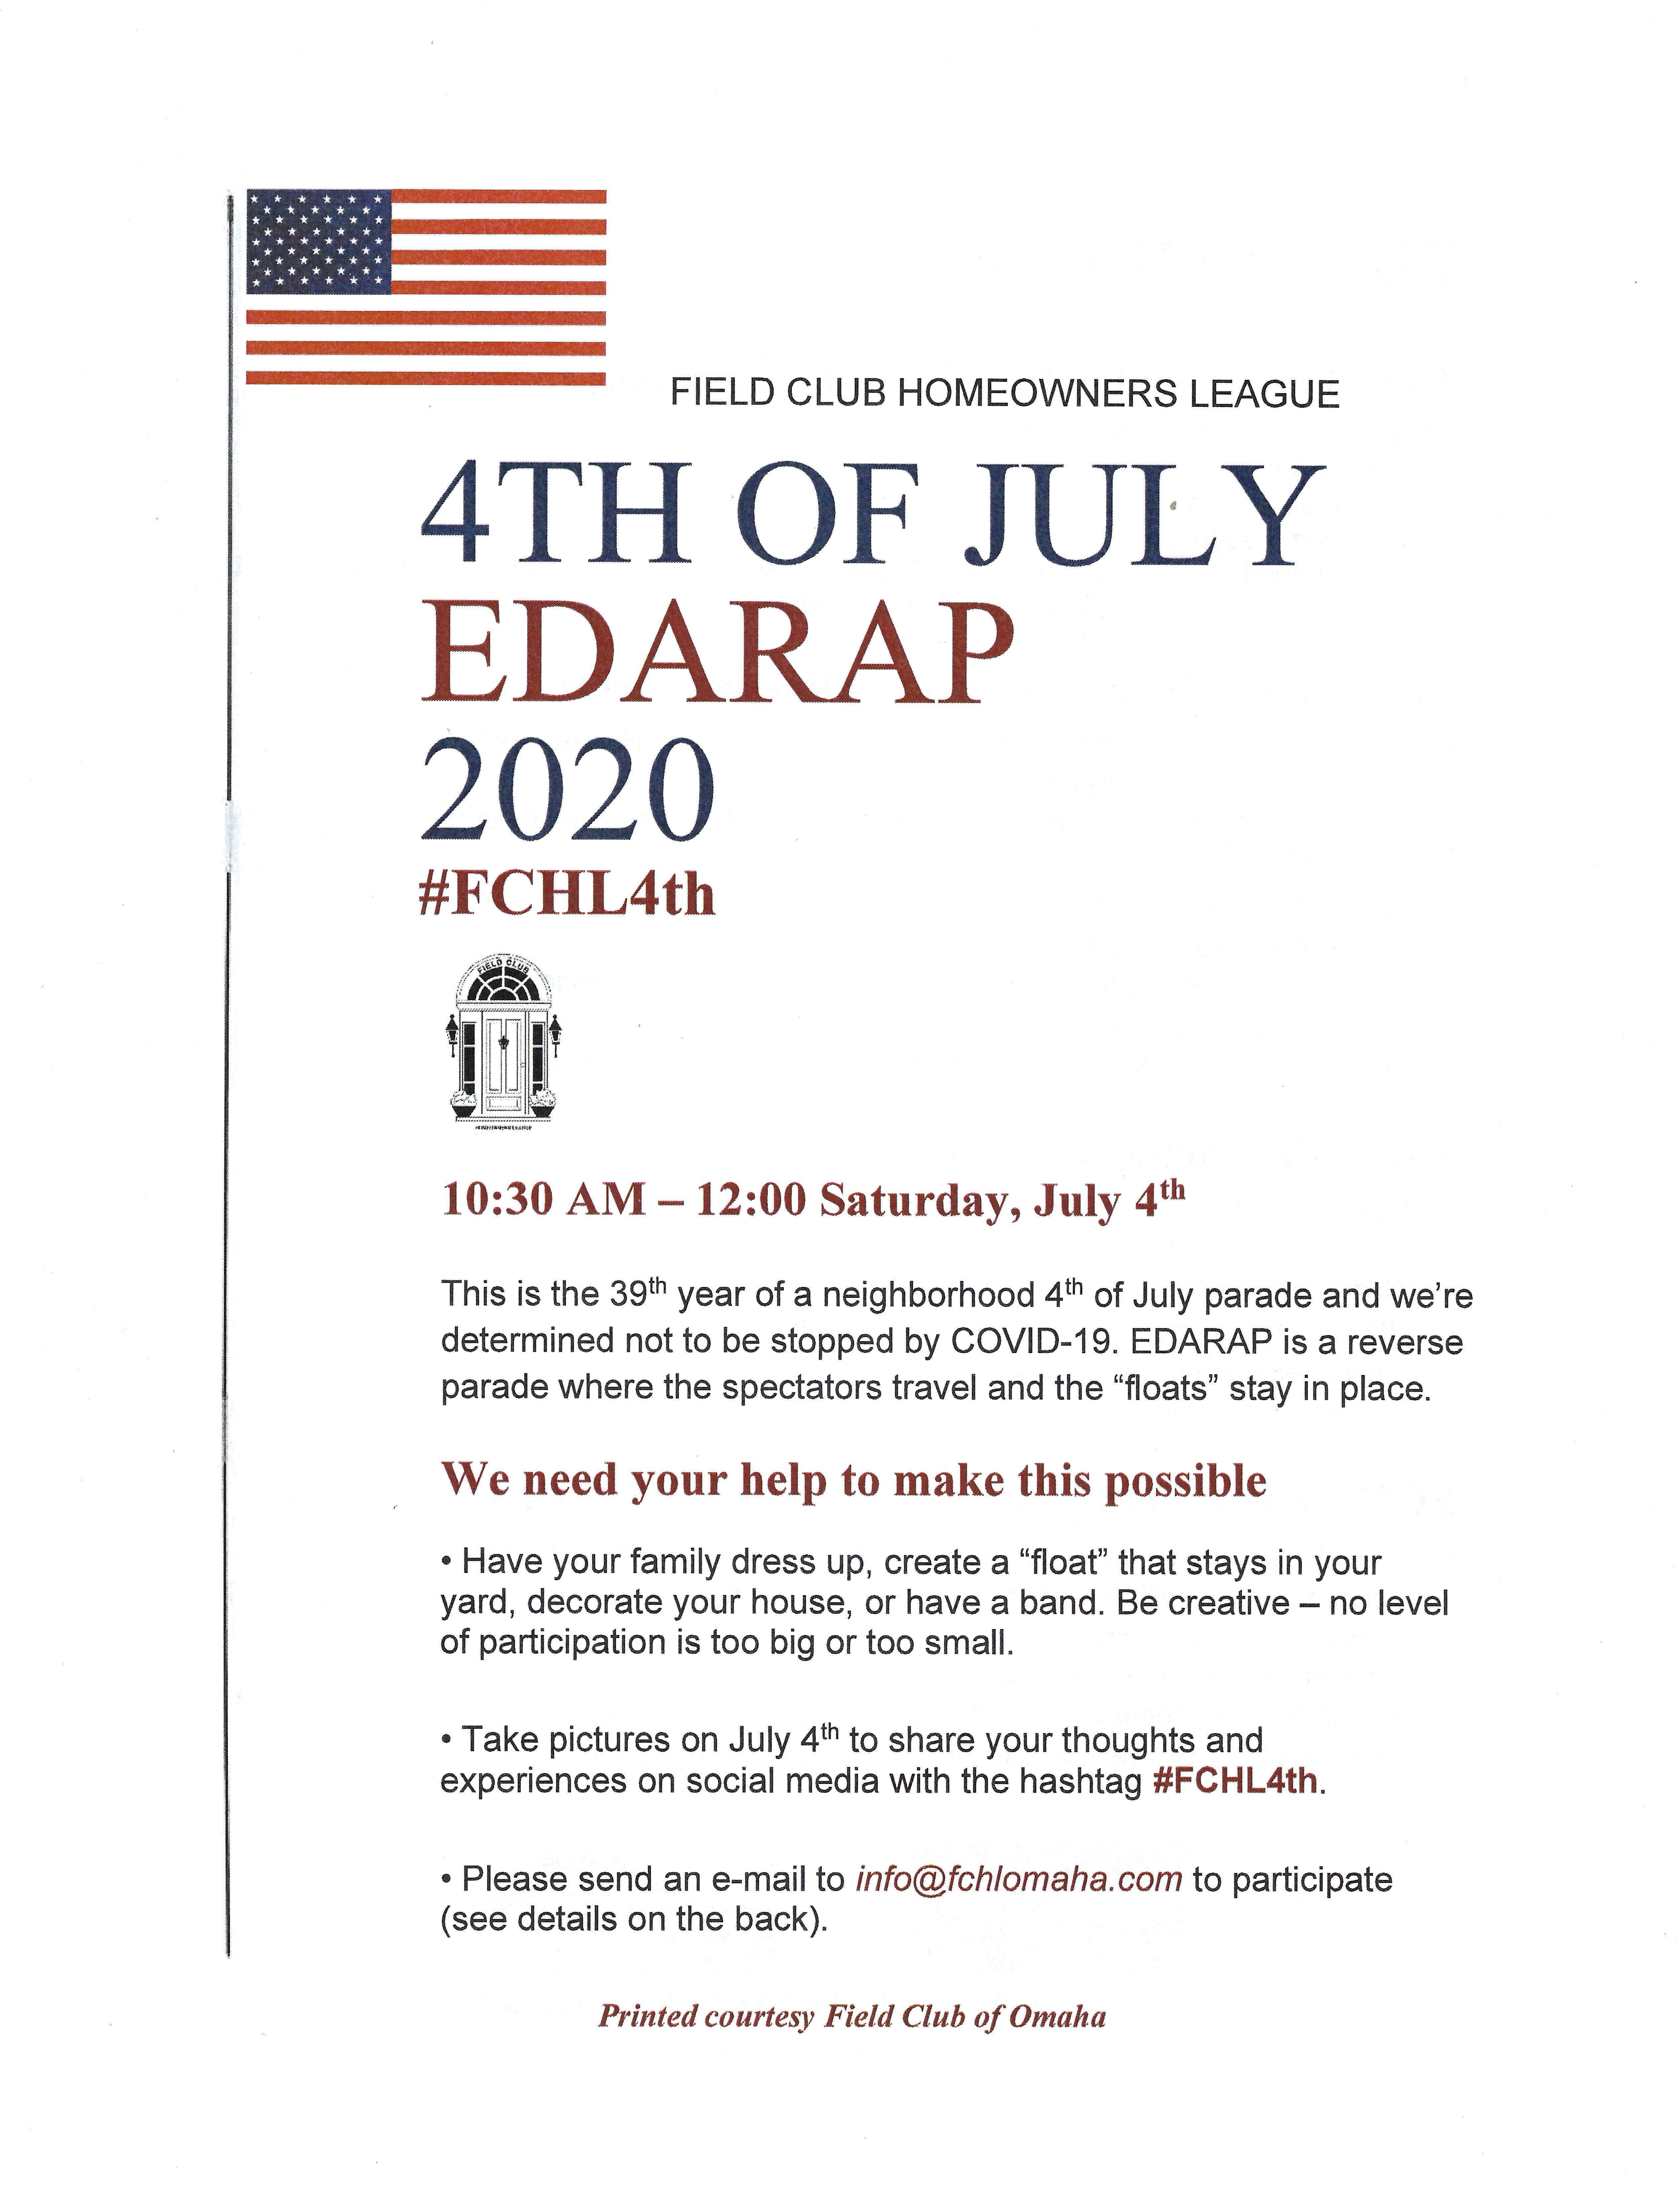 edarap1